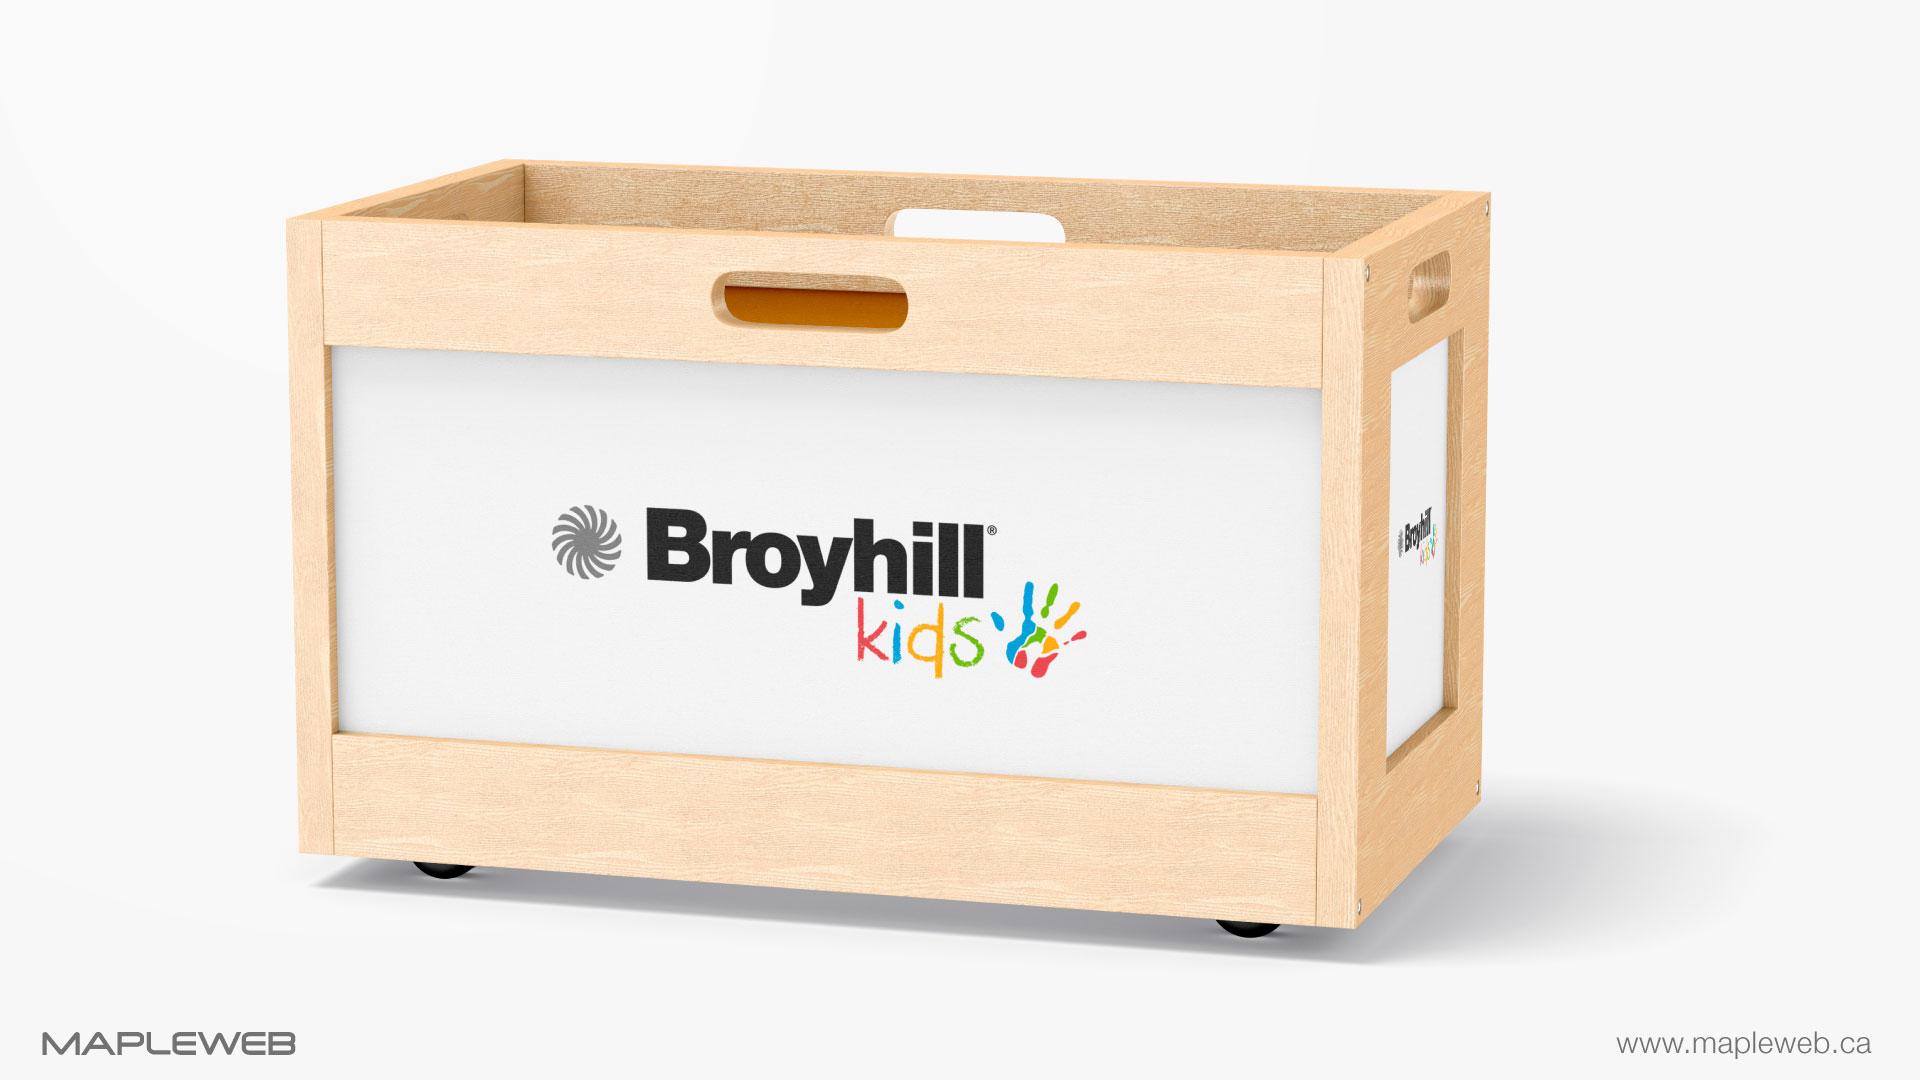 broyhill-kids-brand-logo-design-by-mapleweb-vancouver-canada-kids-cloth-trolly-mock